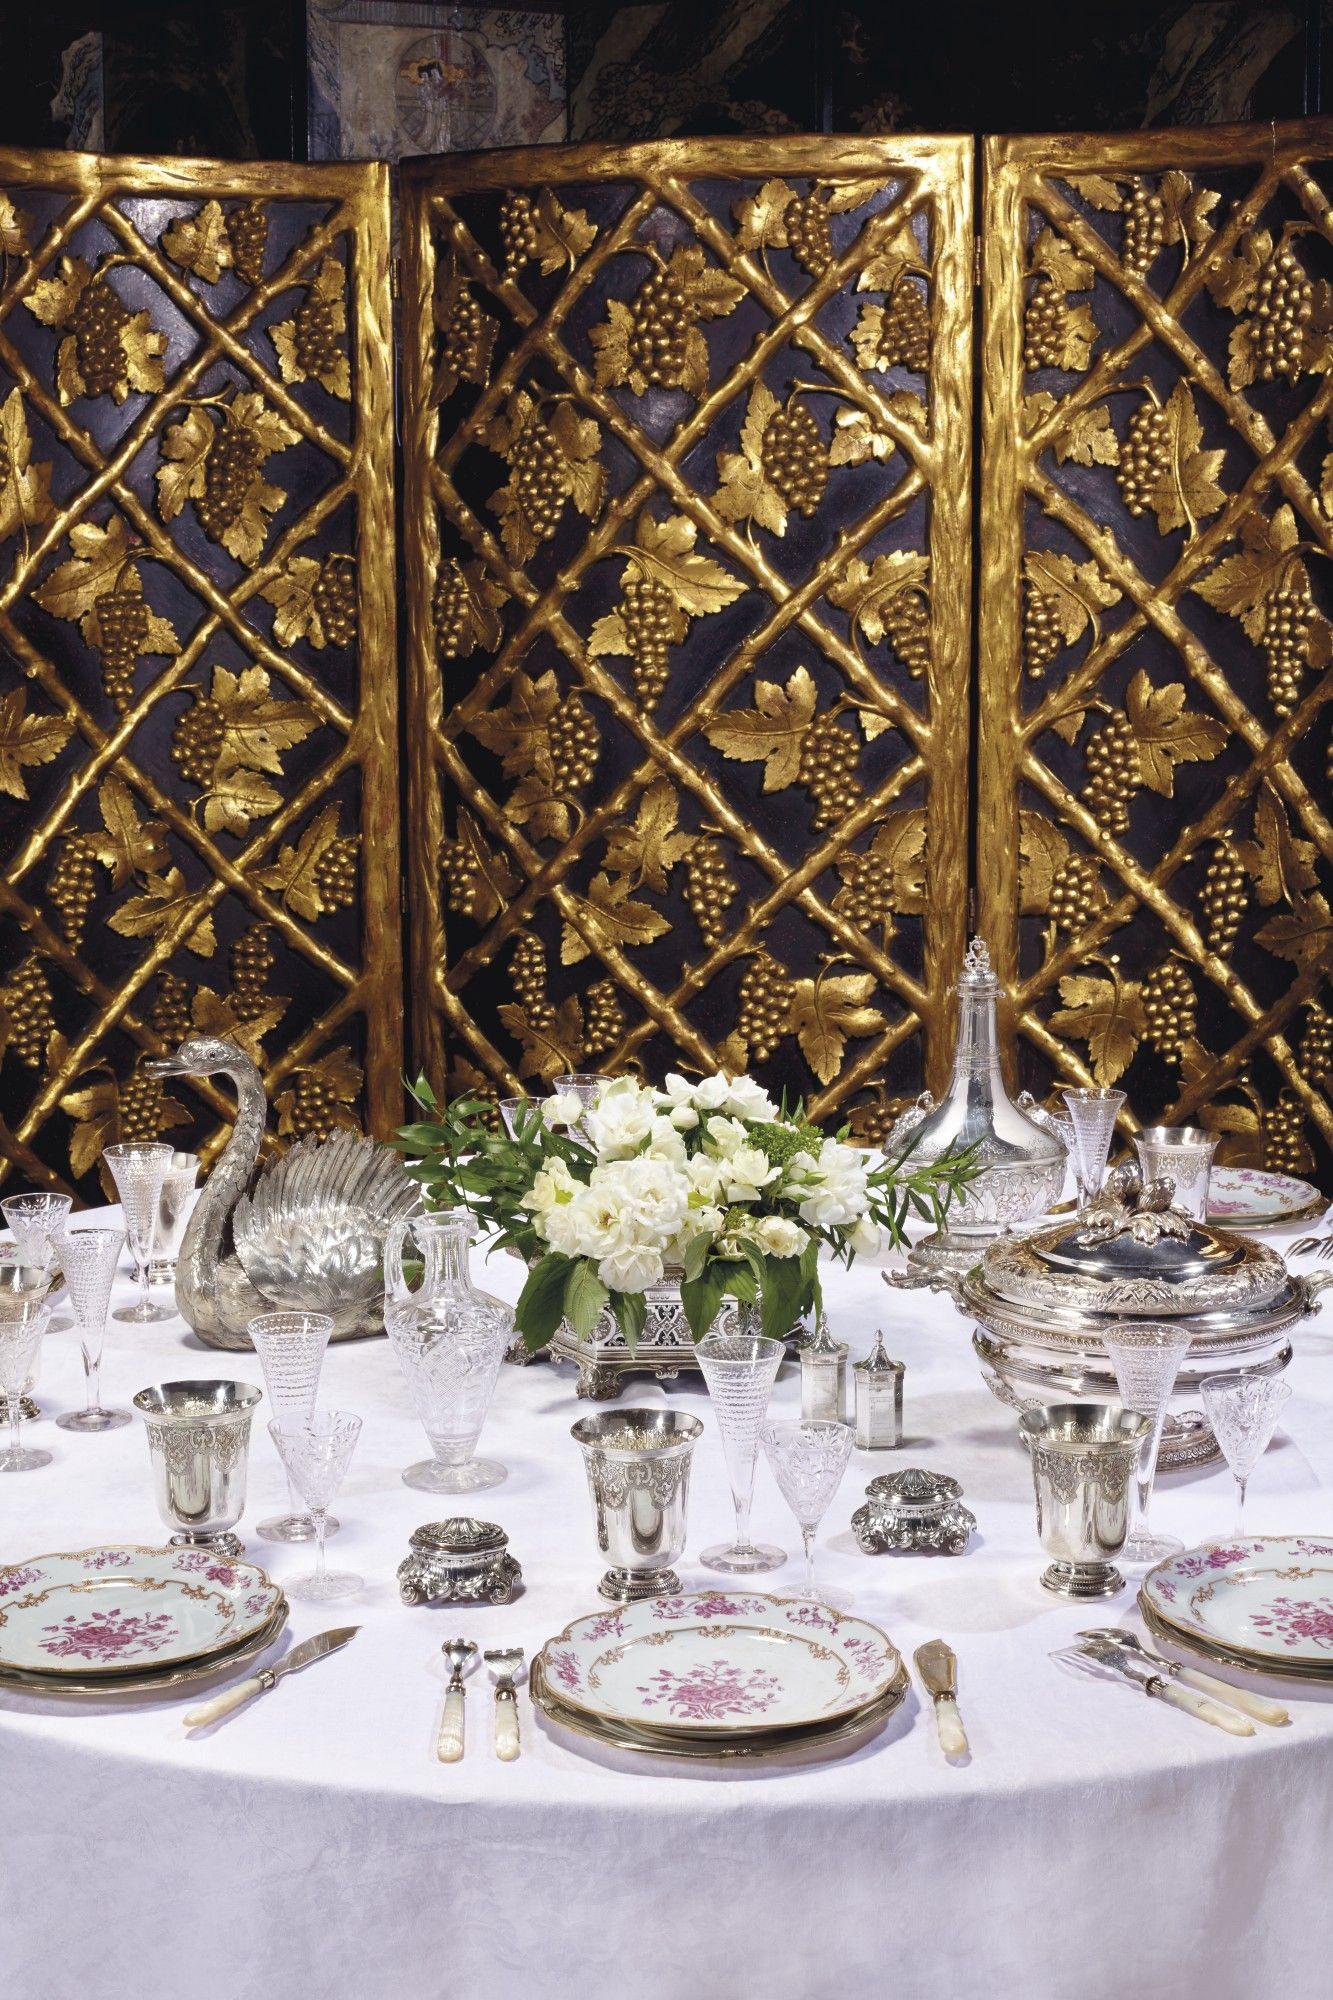 Habitually Chic® » Collection Alberto Pinto | Set the table ...